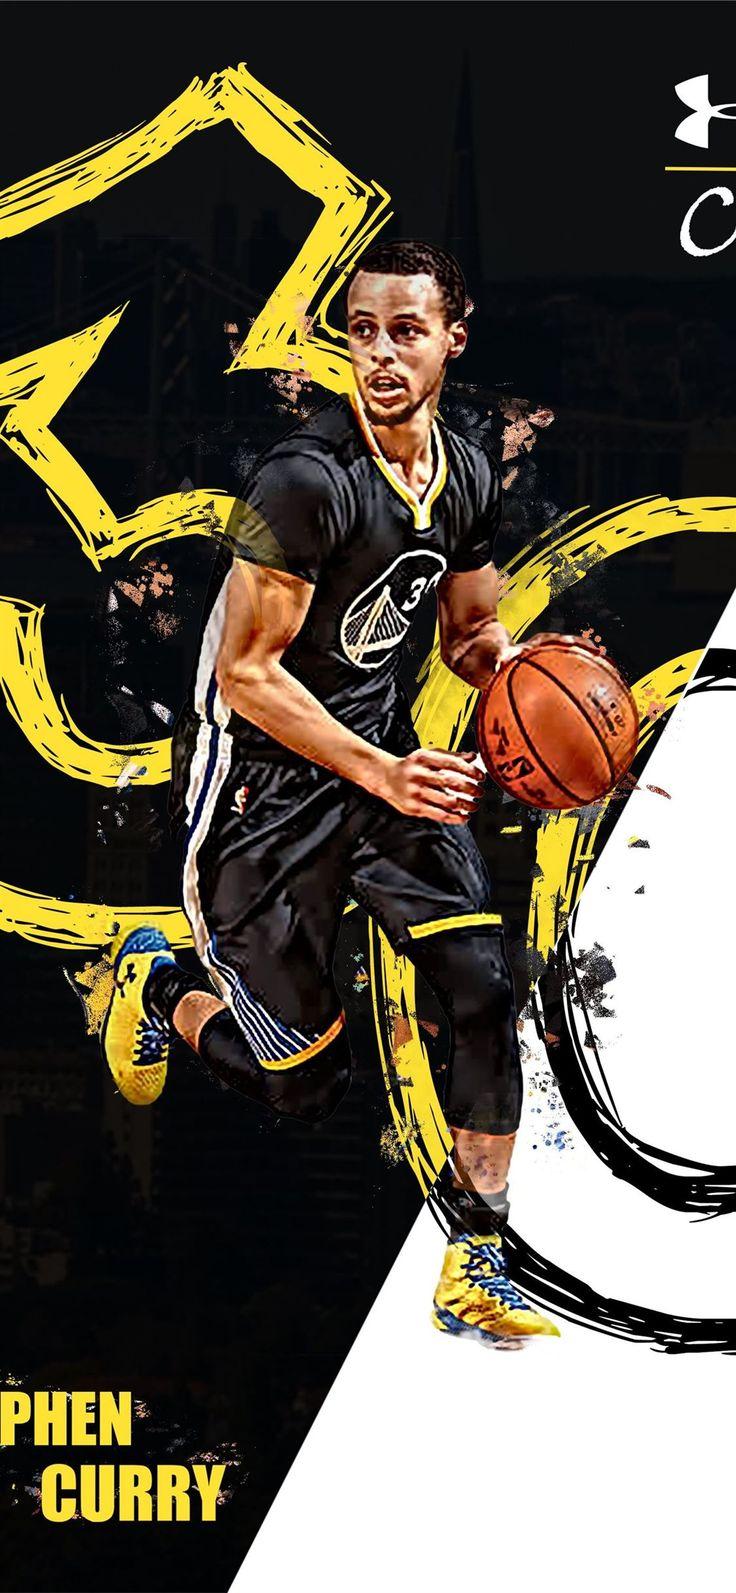 Stephen Curry Stephencurry Sportcelebrity Basketballcelebrity Unitedstates Iphonexwallpaper Stephen Curry Basketball Stephen Curry Nba Stephen Curry